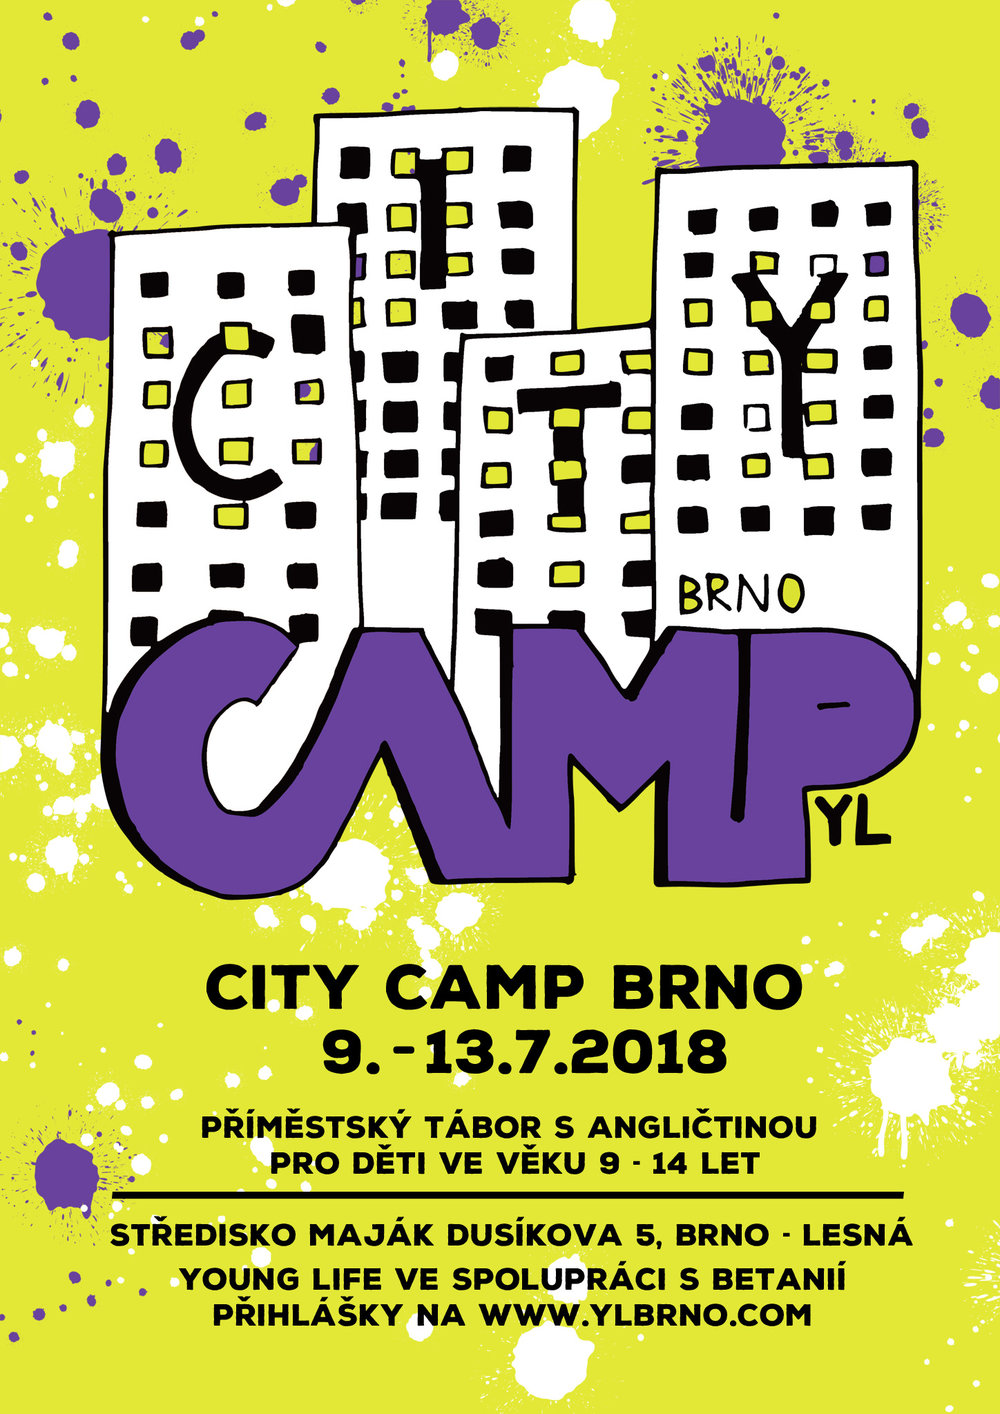 City Camp 2018_zelena_2048.jpg